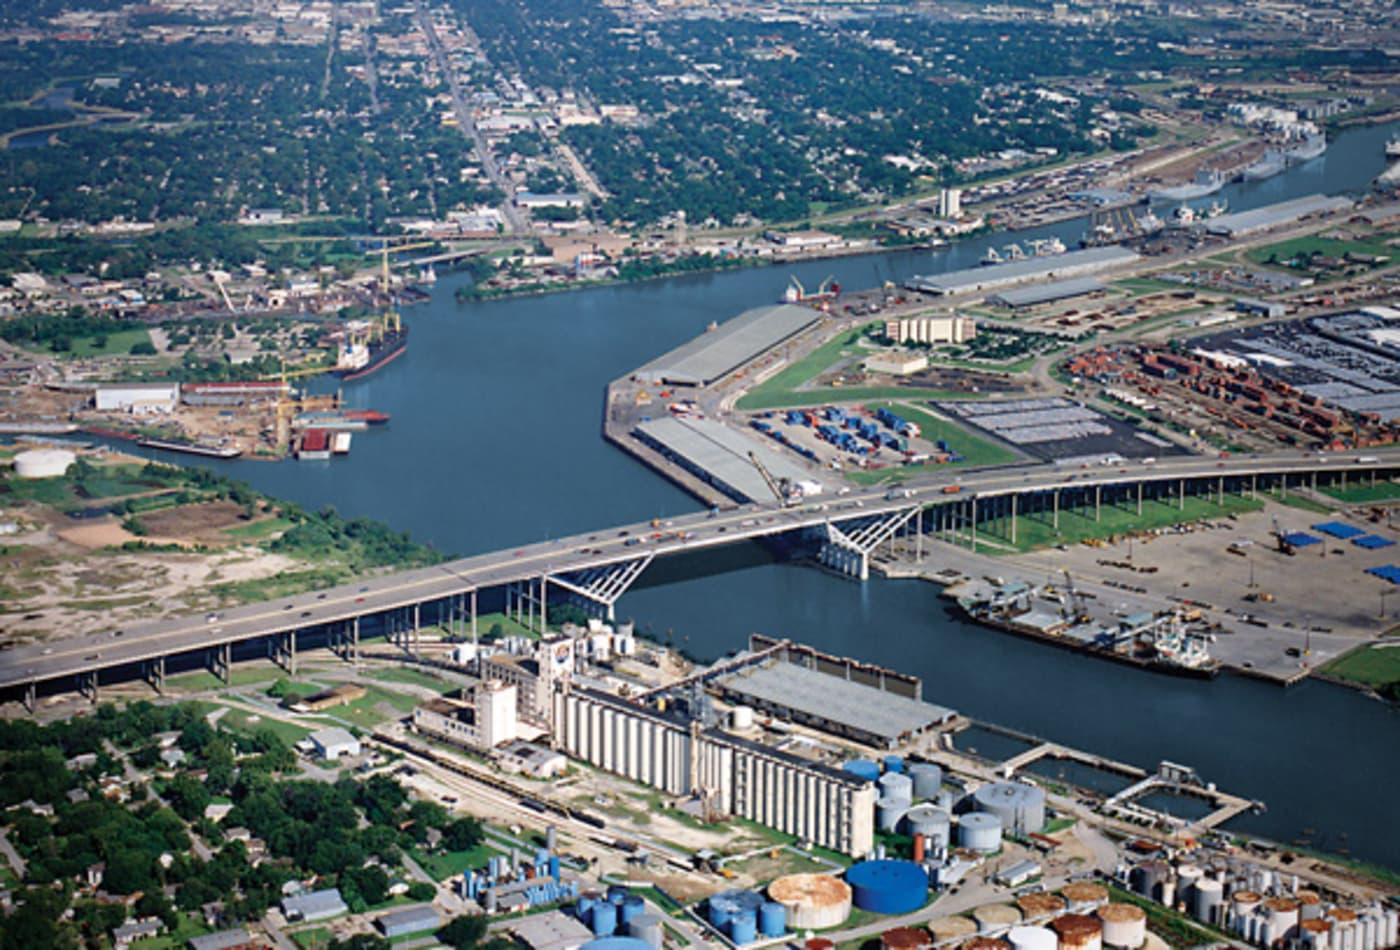 15-Busiest-US-Trade-Hubs-port-of-houston.jpg